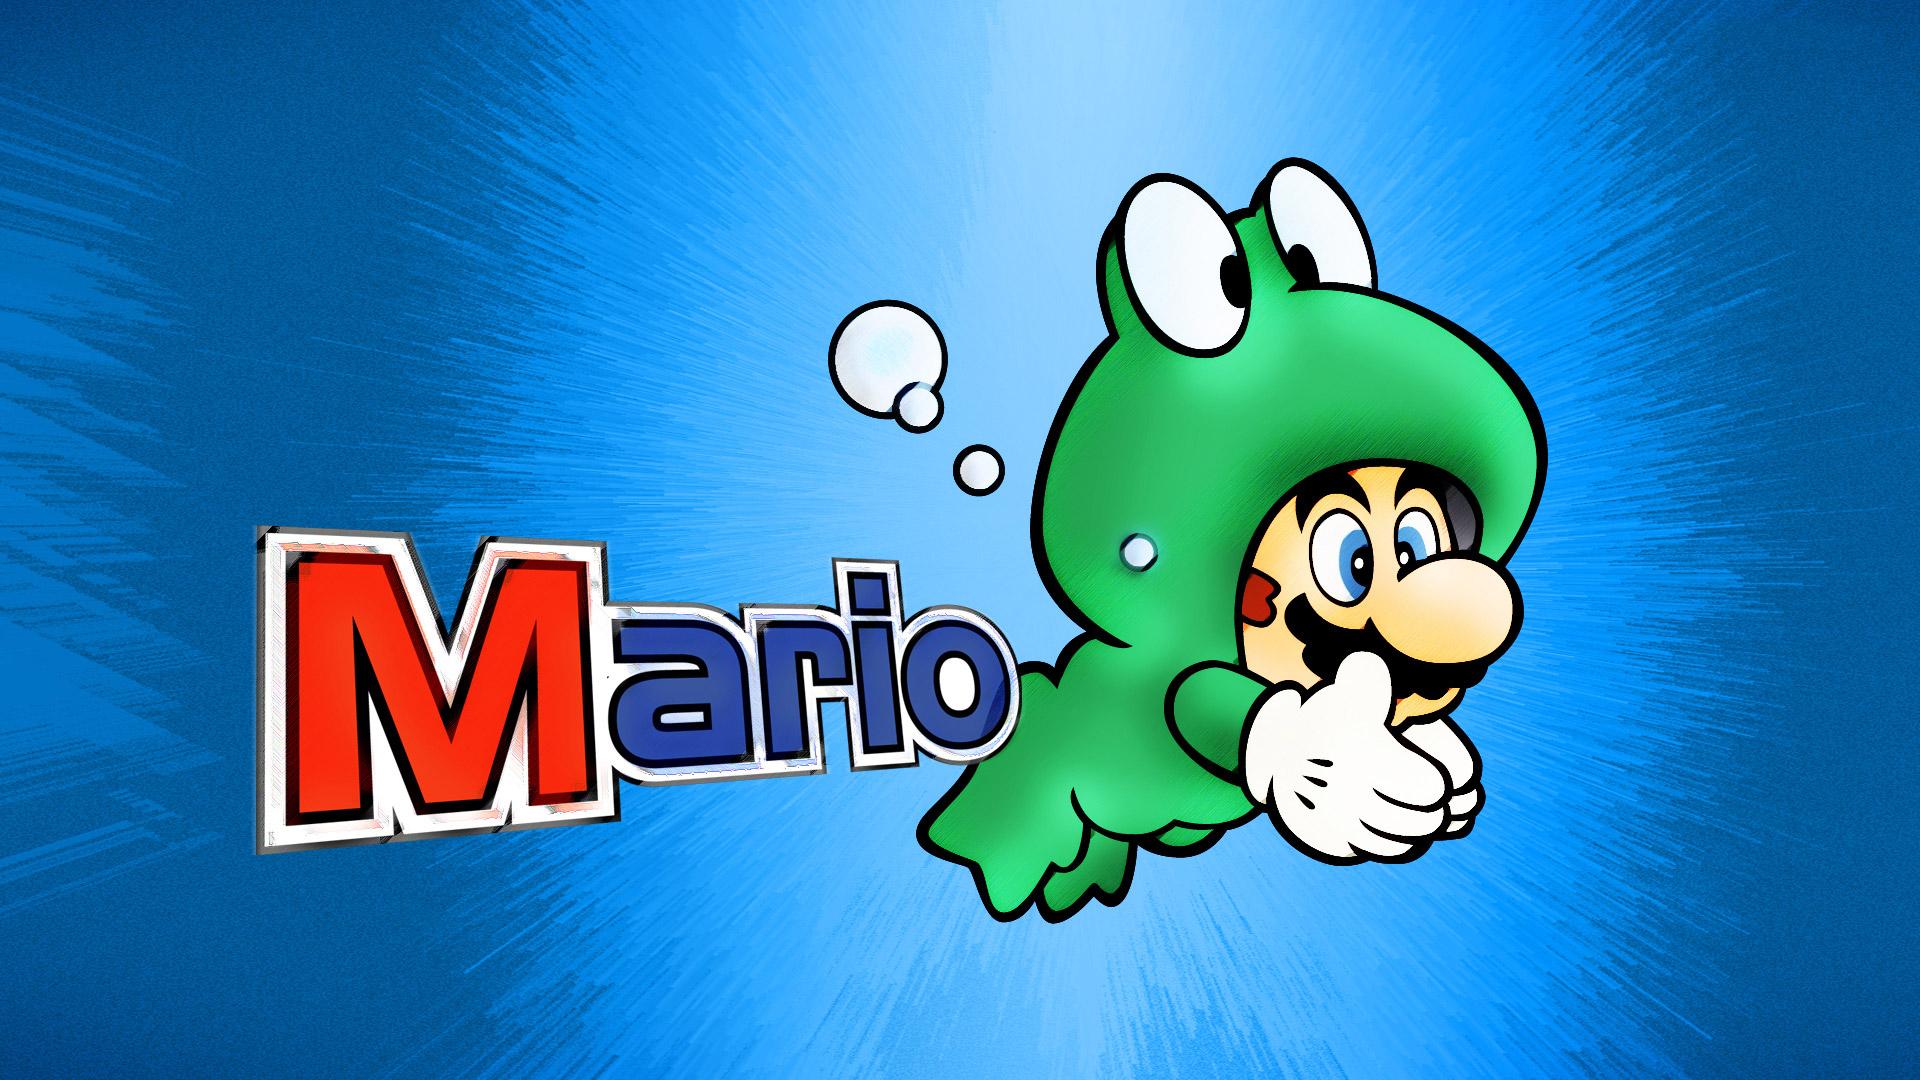 Free Super Mario Bros. 3 Wallpaper in 1920x1080